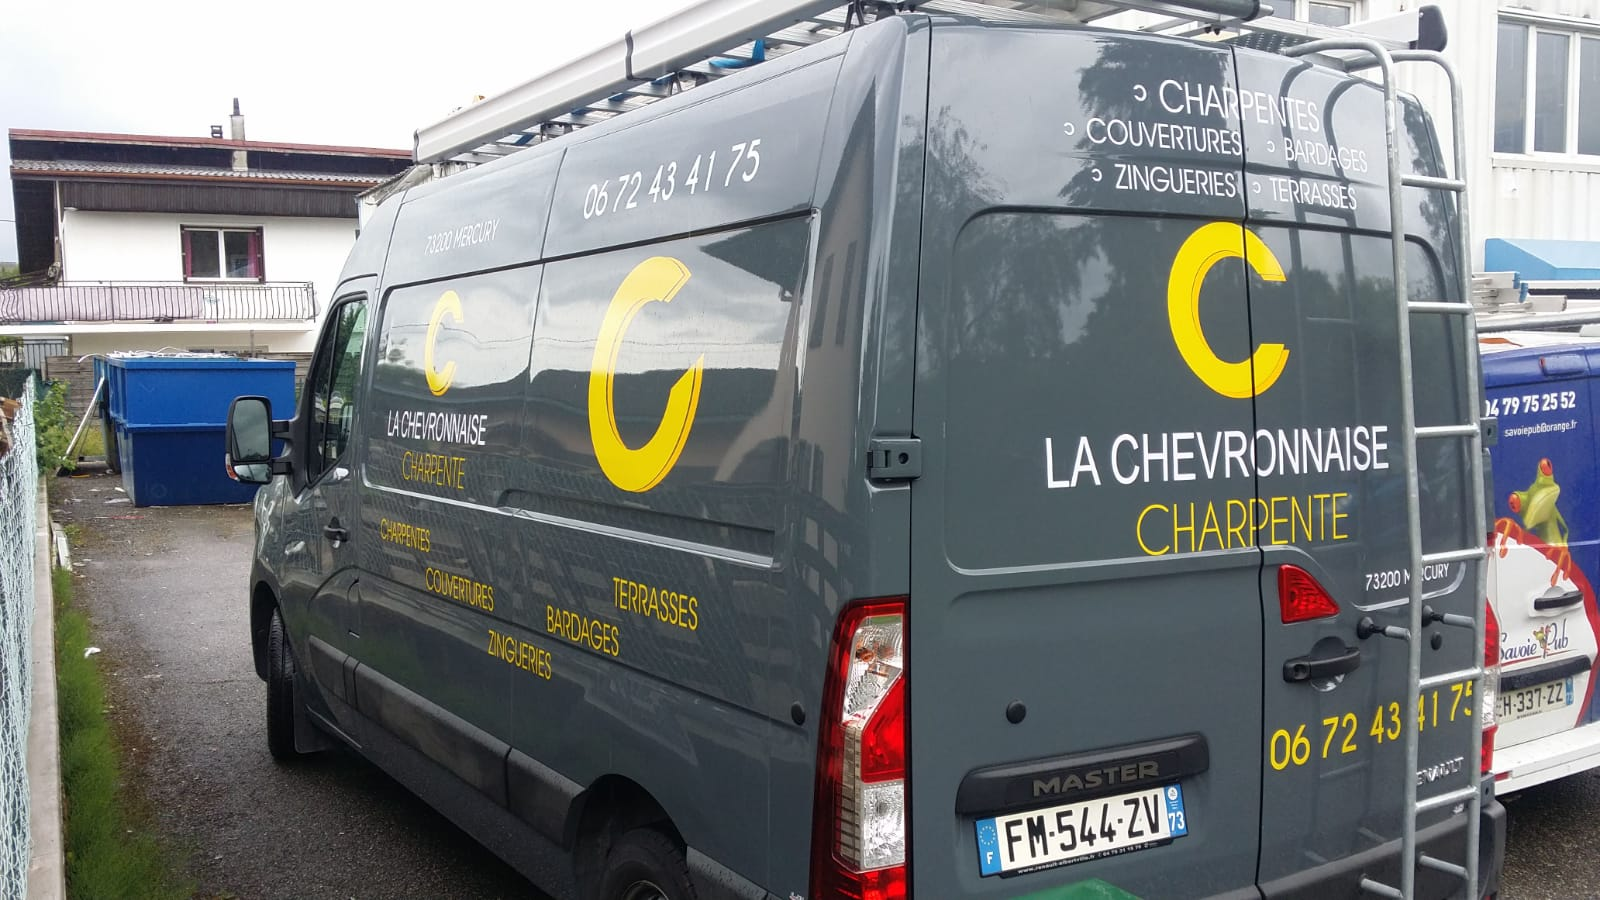 LA CHEVRONNAISE CHARPENTE (1)